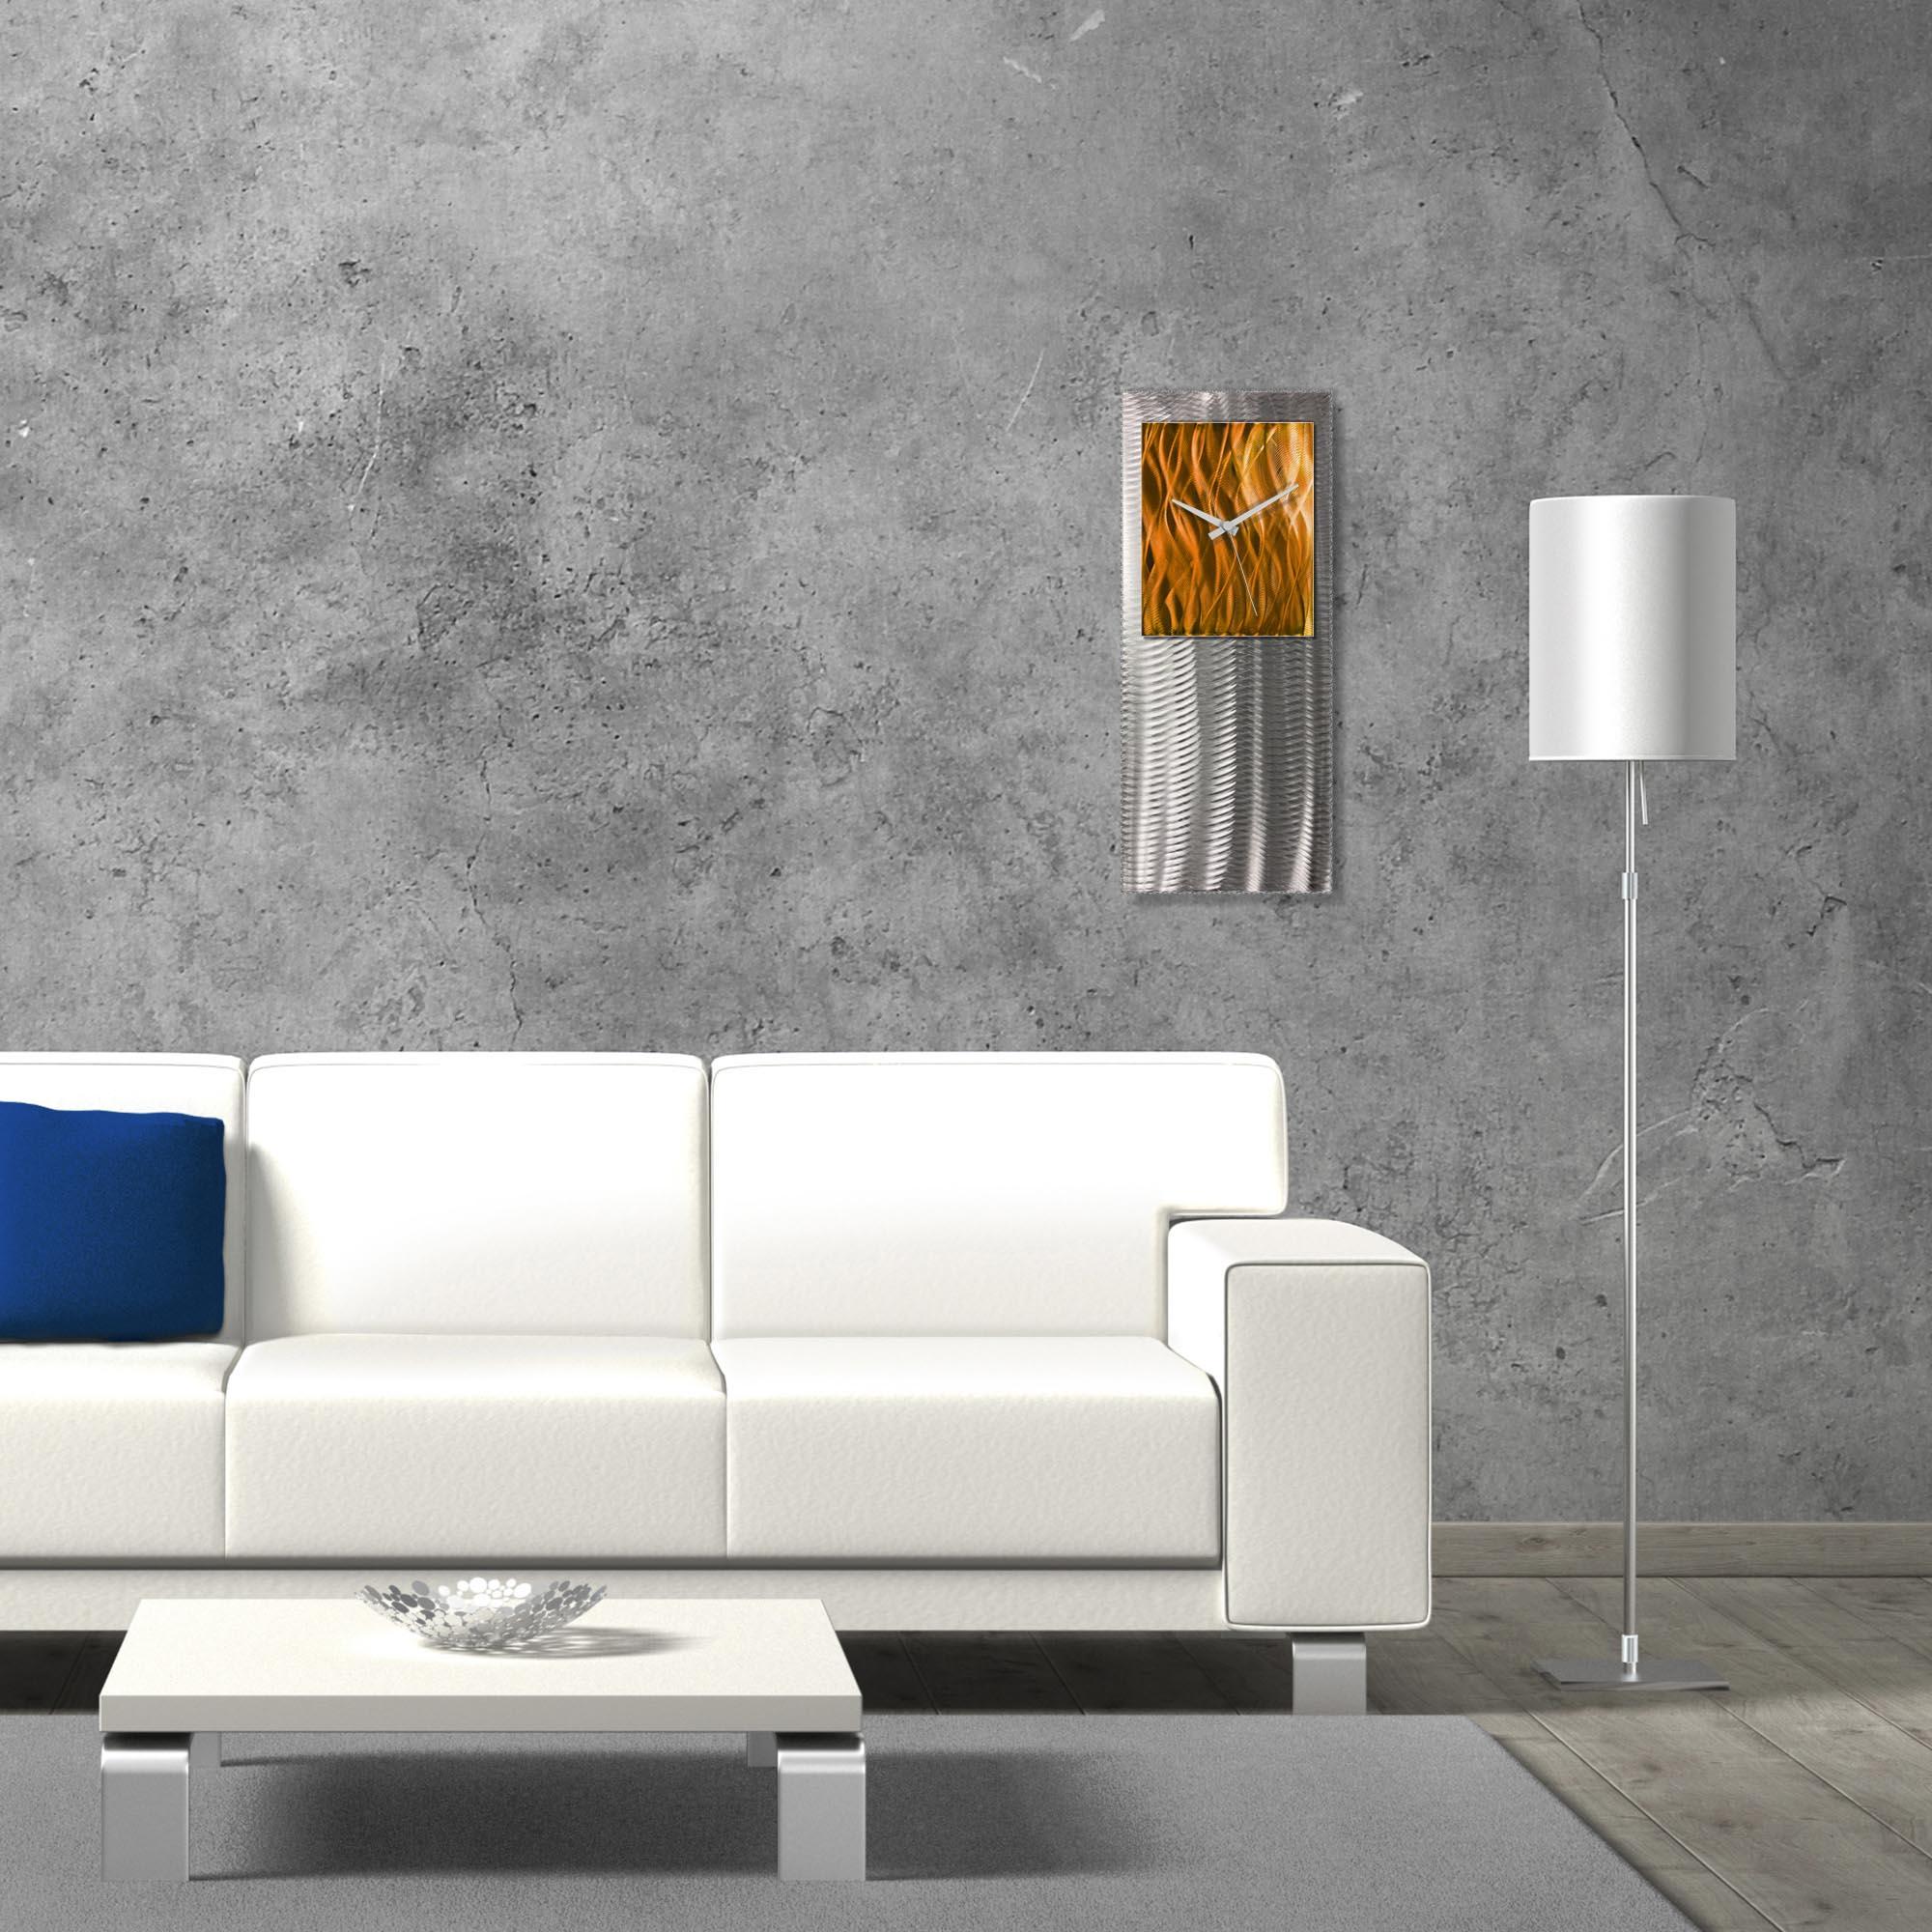 Metal Art Studio Abstract Decor Orange Studio Clock 10in x 24in - Lifestyle View